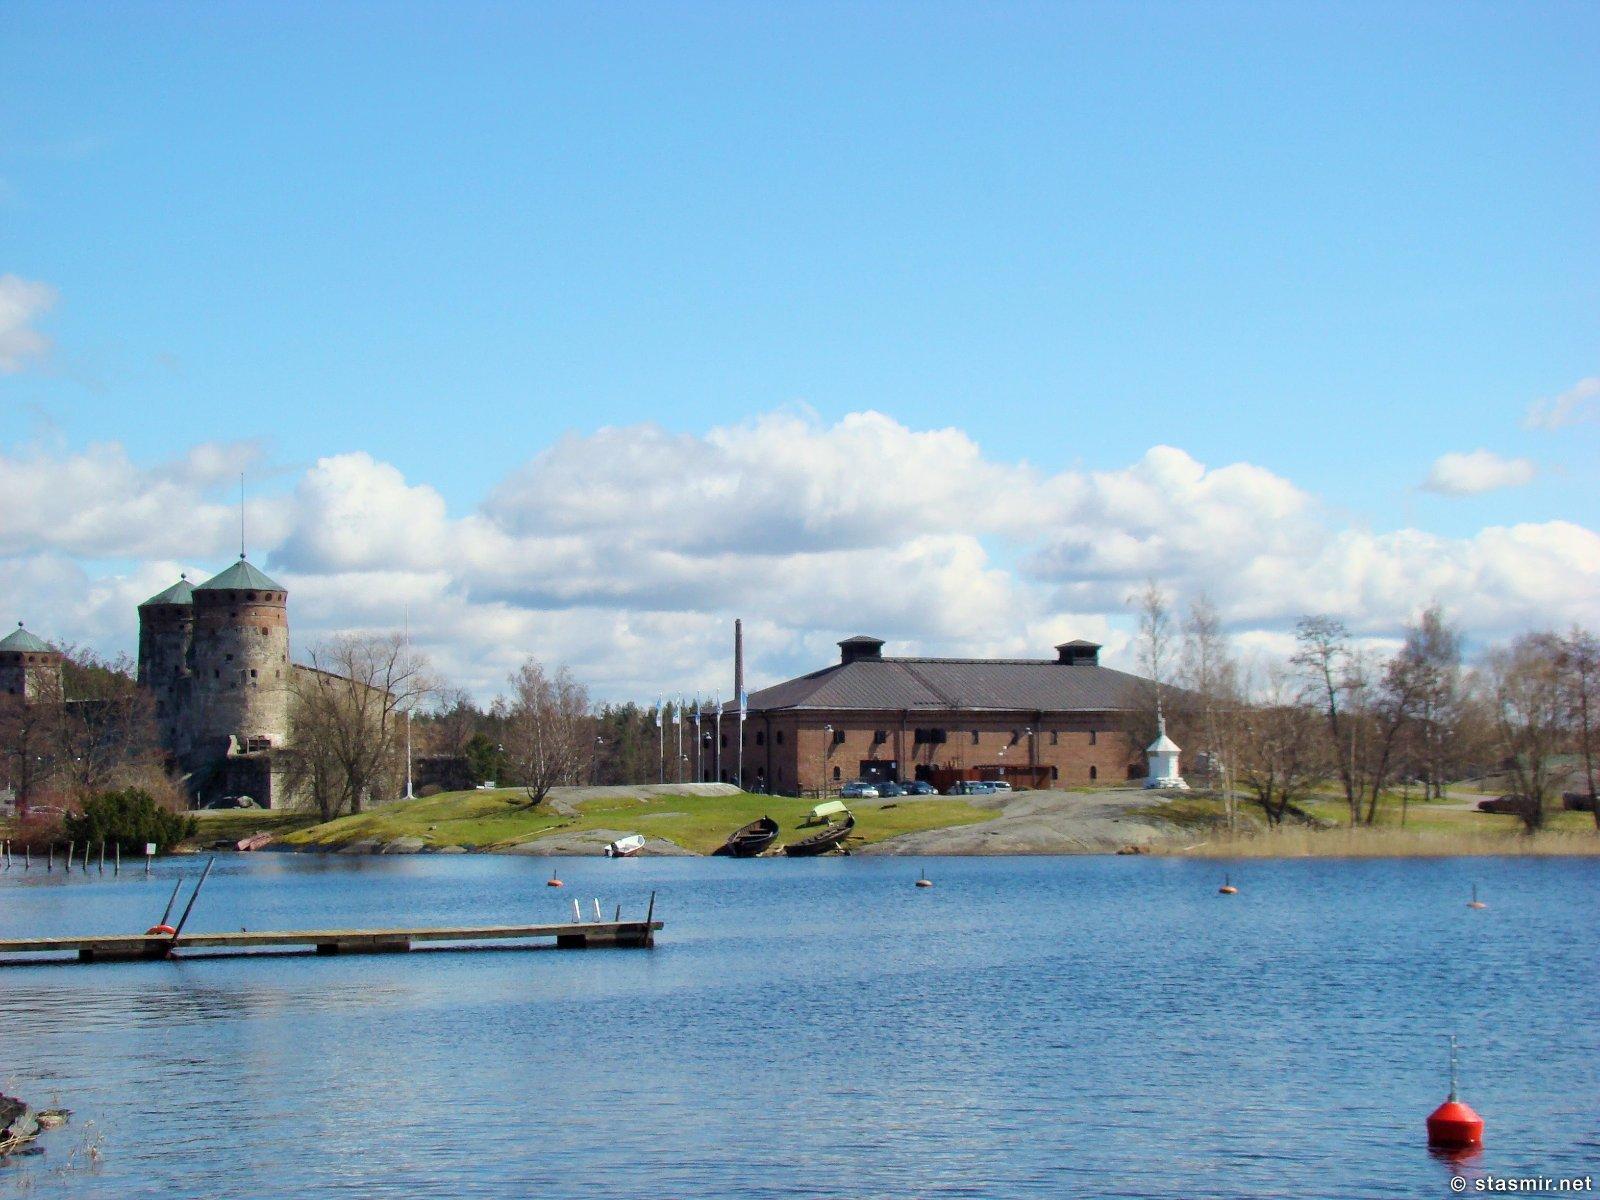 Вид на крепость Савонлинна, Олавинлинна, Олафсборг, на озерах Хаапавеси и Пихлаявеси весной, фото Стасмир, Photo Stasmir